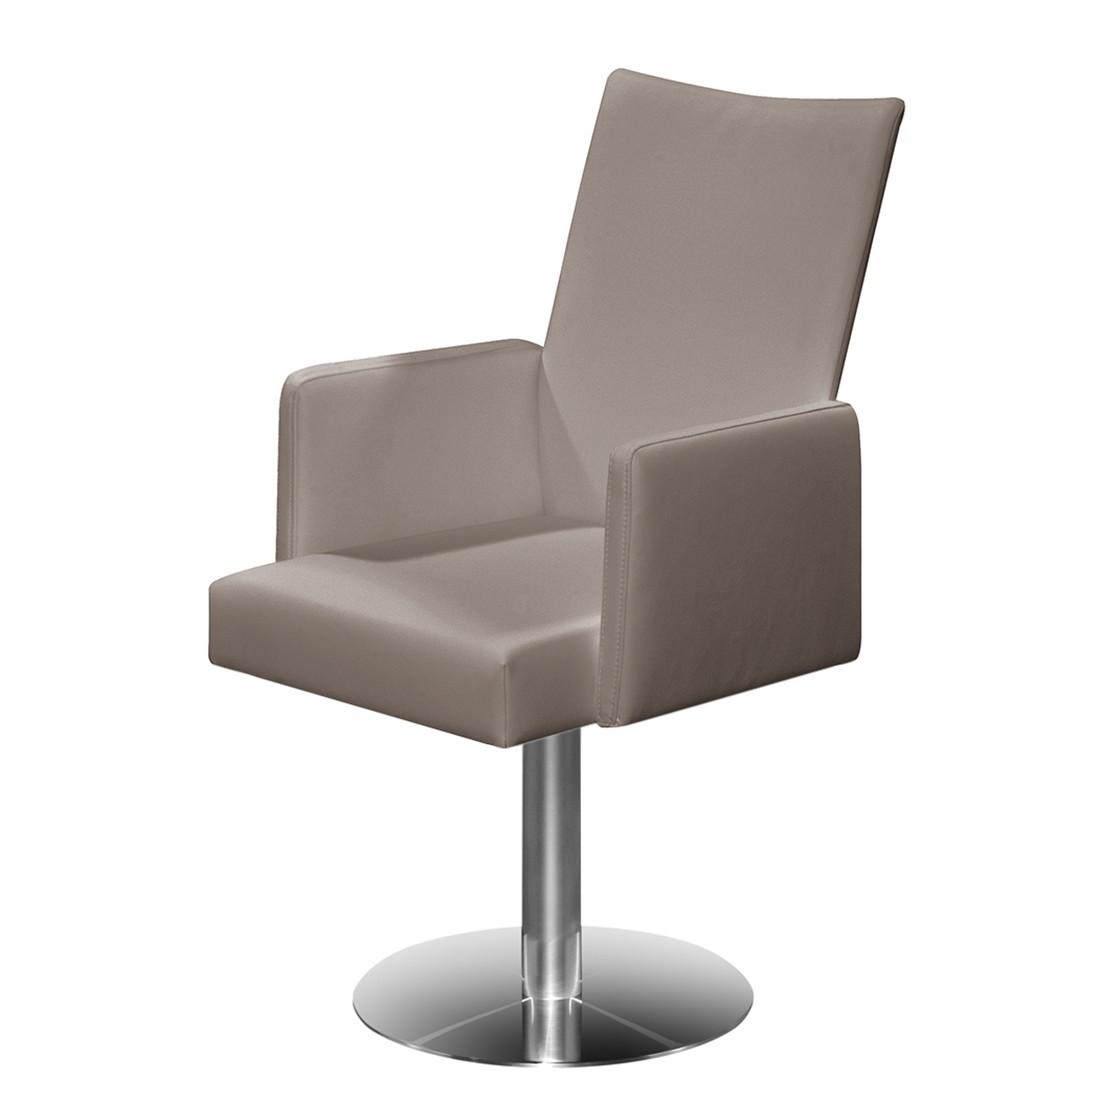 stuhl sitzh he 60 cm preisvergleiche erfahrungsberichte. Black Bedroom Furniture Sets. Home Design Ideas